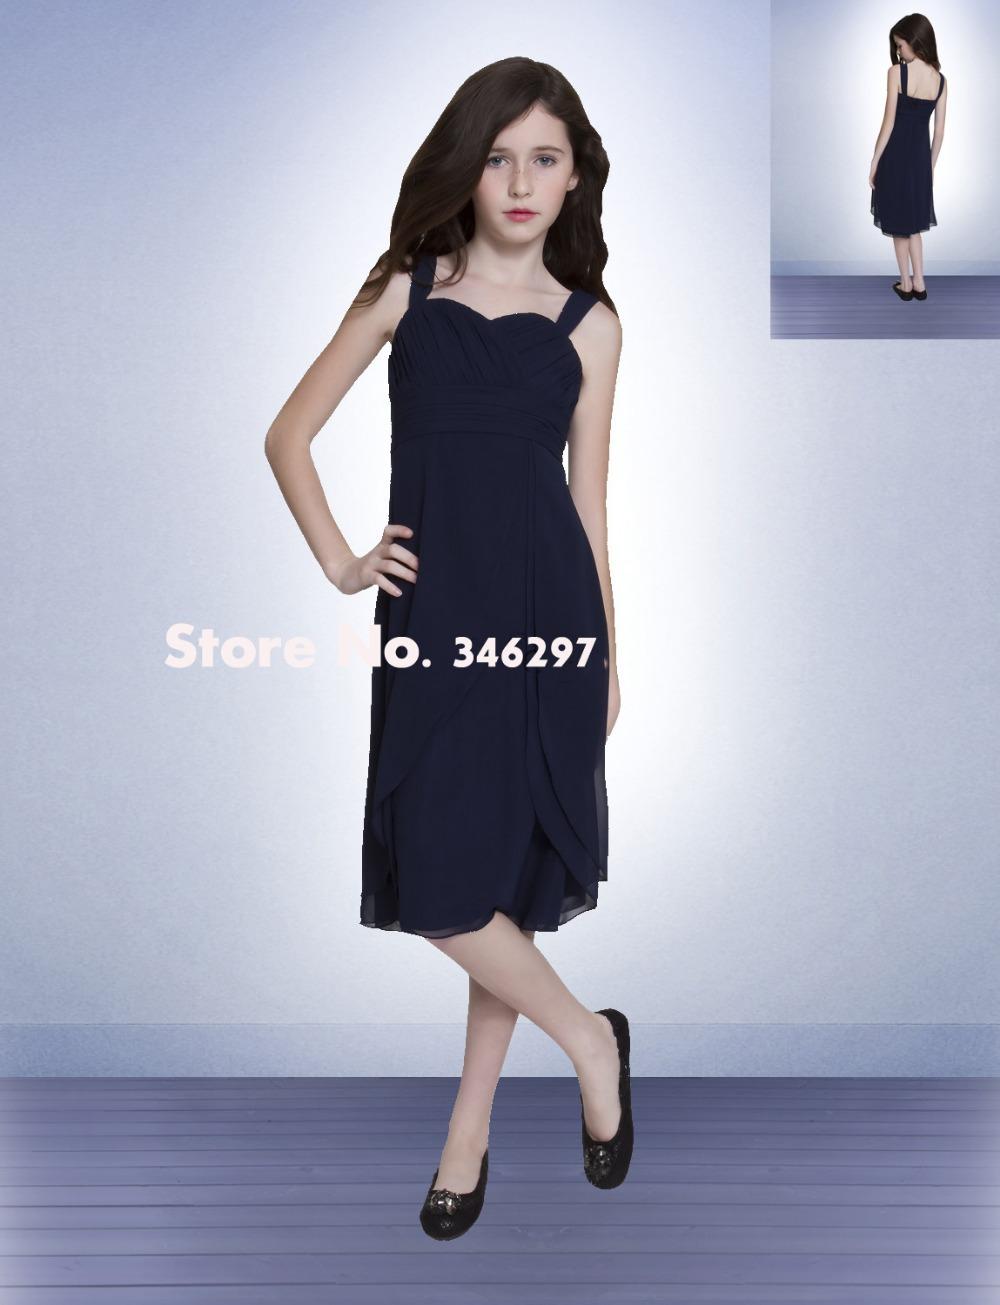 Graduation Dresses For Juniors Plus Size - Holiday Dresses